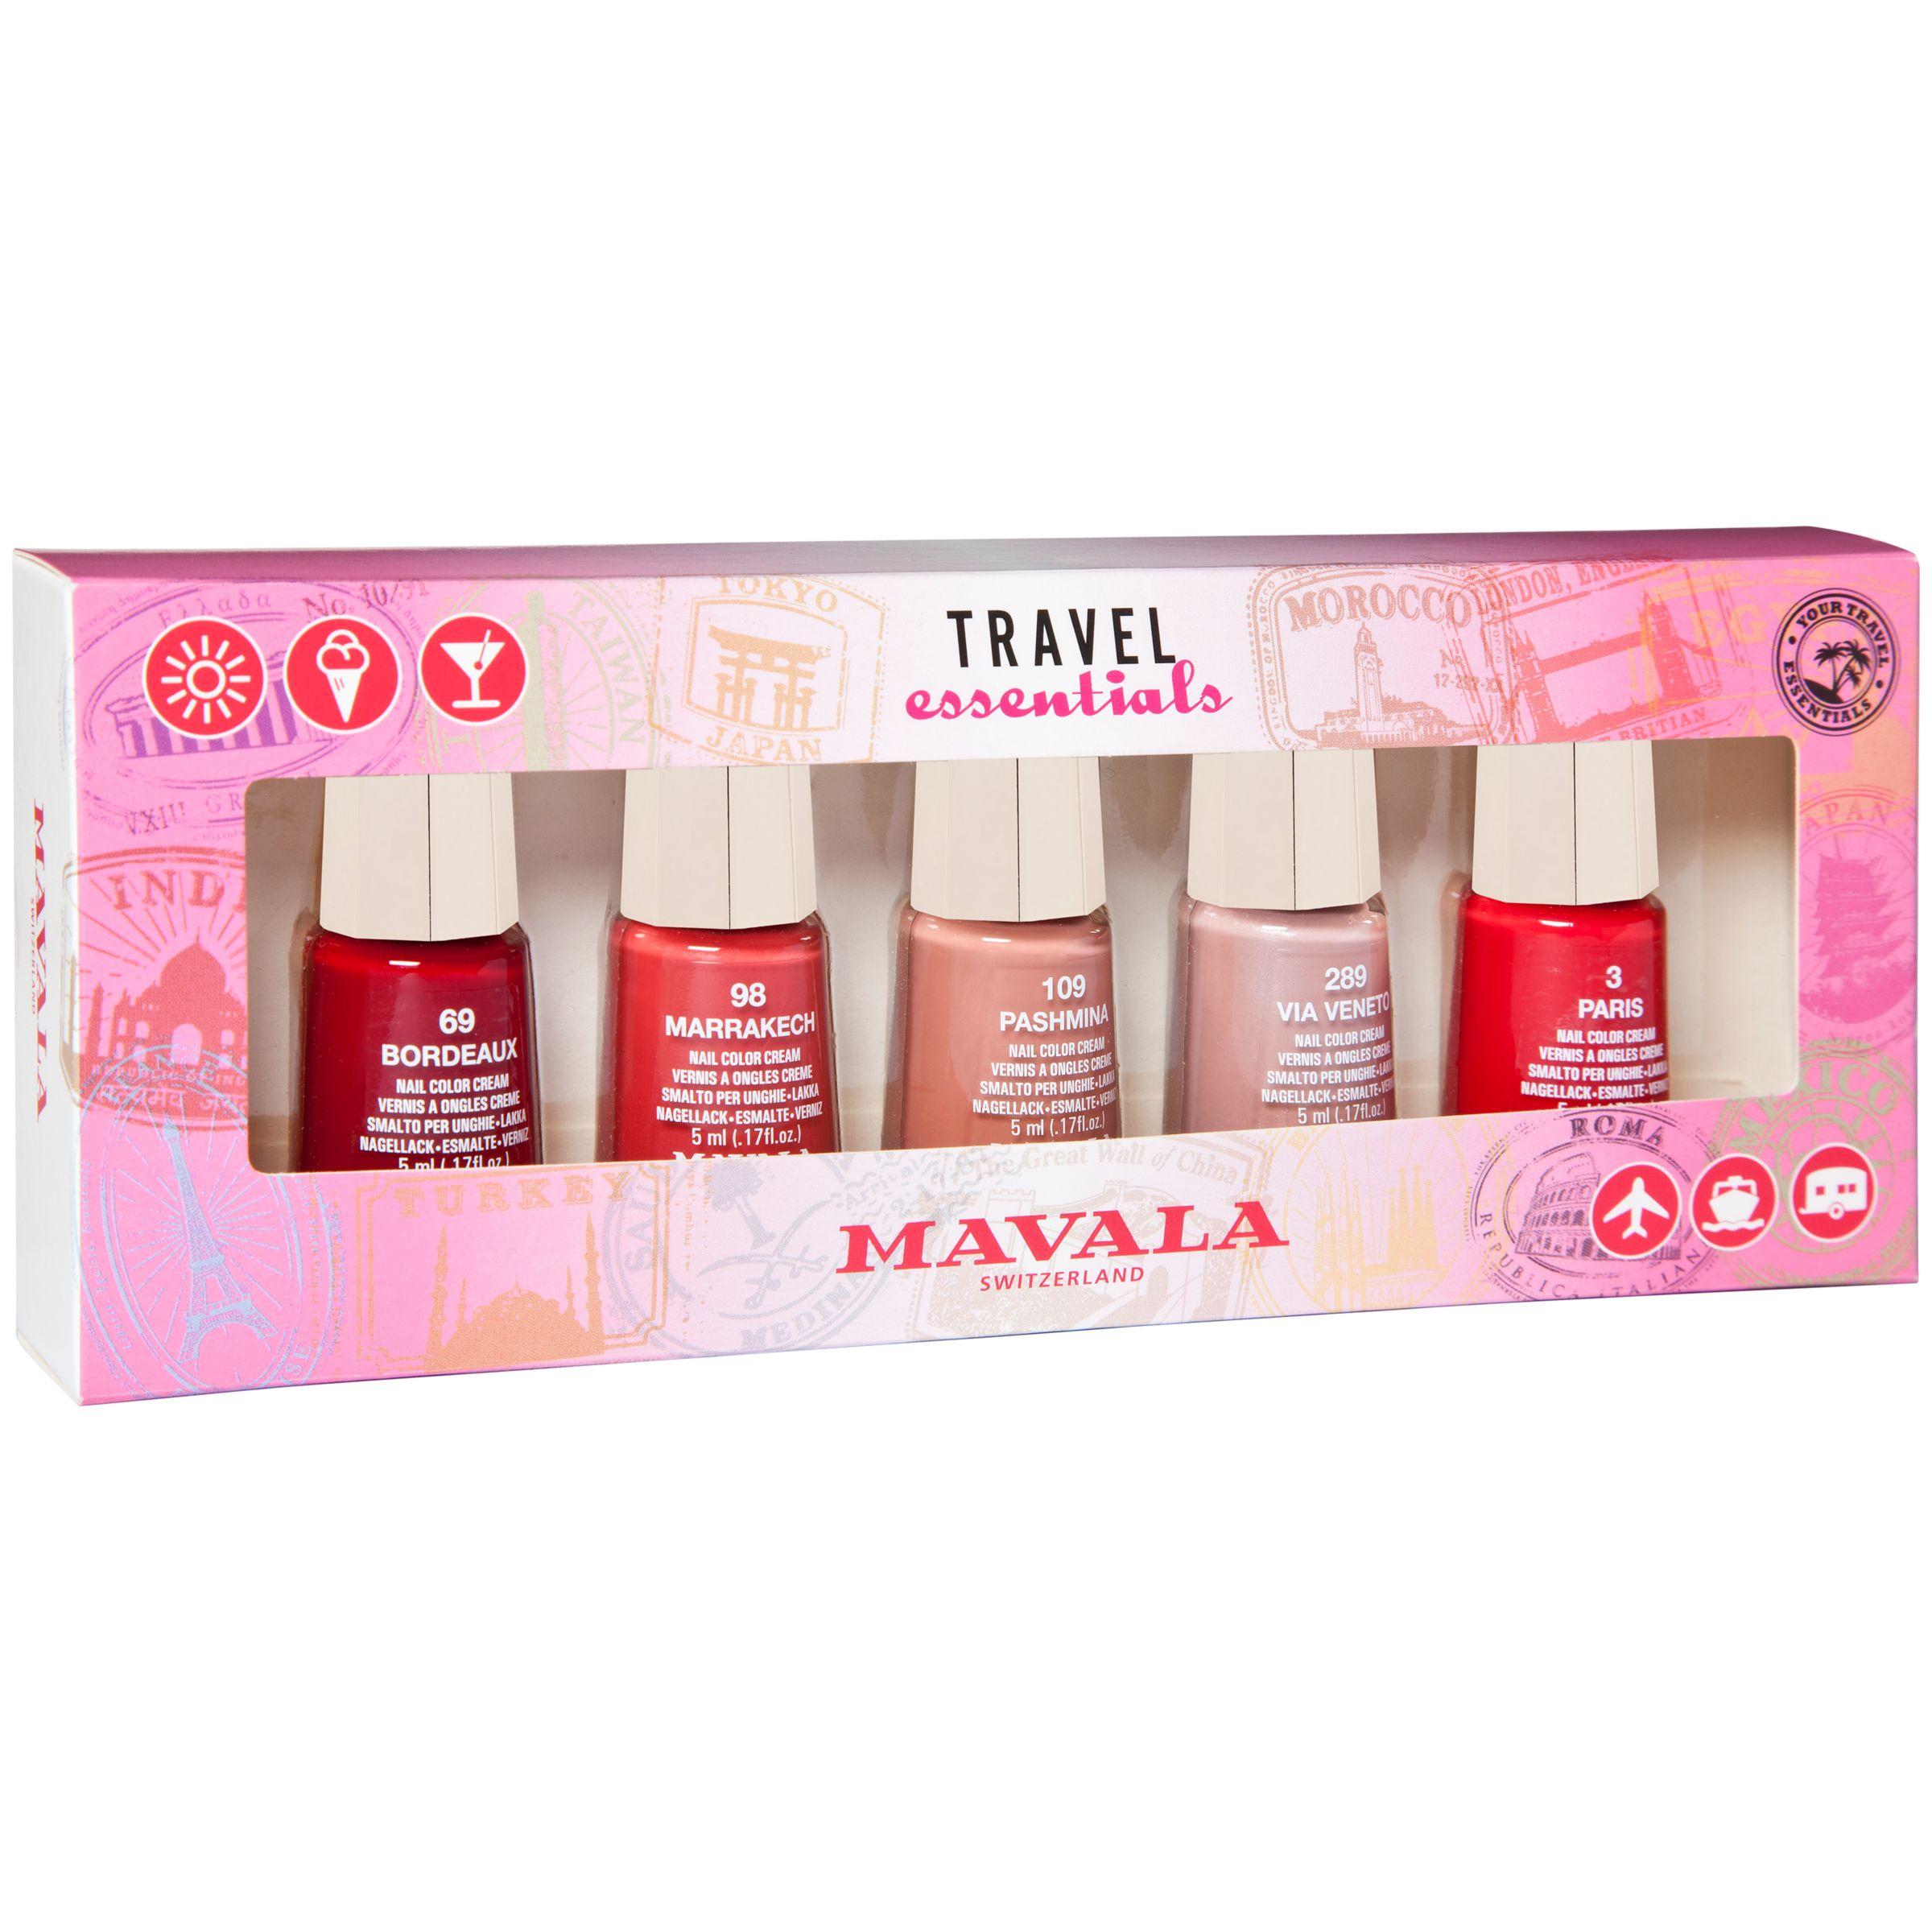 Mavala 5 Piece Nail Polish Gift Set 5 X 5ml At John Lewis Partners